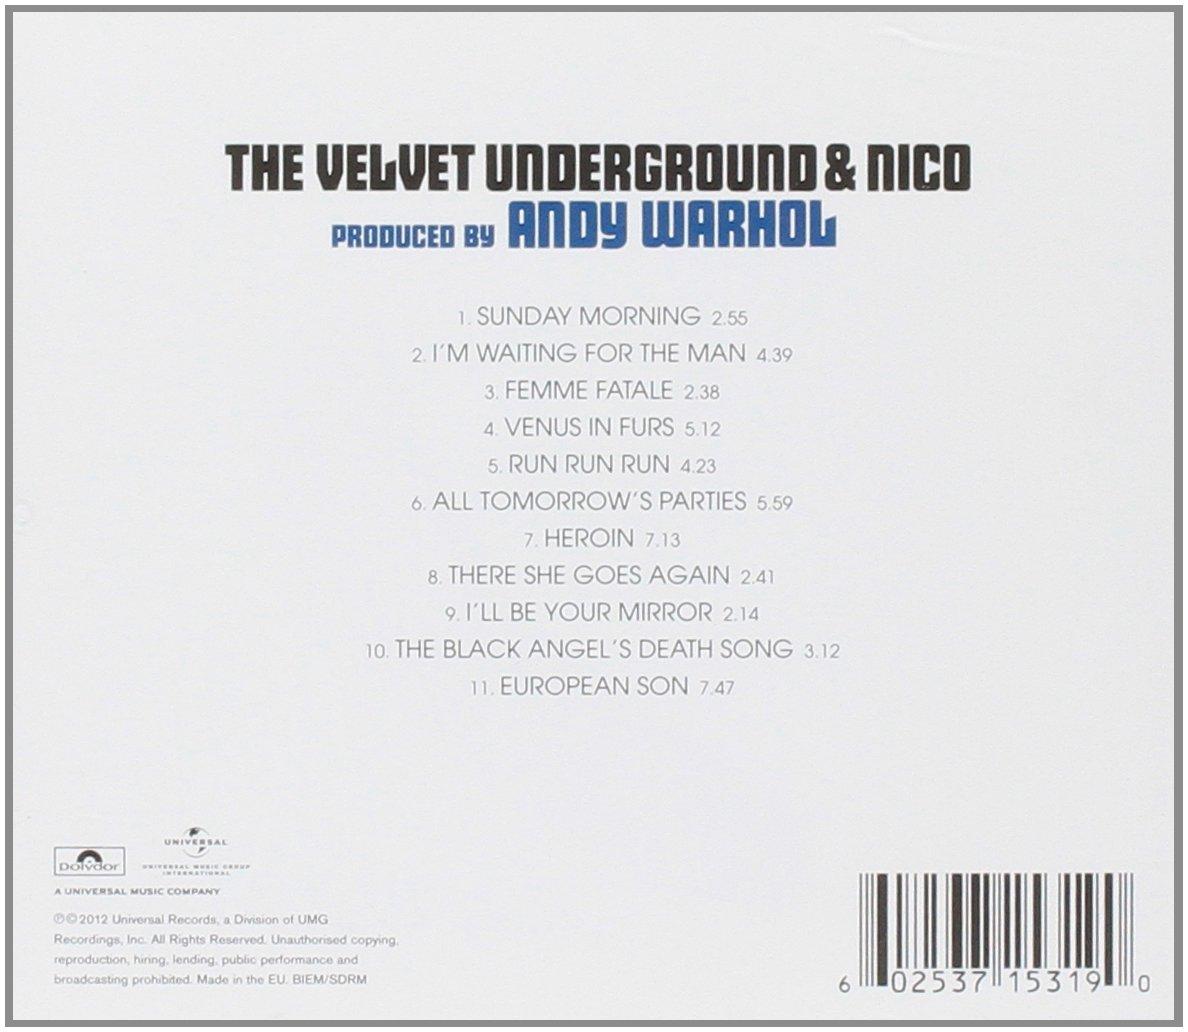 The Velvet Underground & Nico - 45th Anniversary Edition: The ...